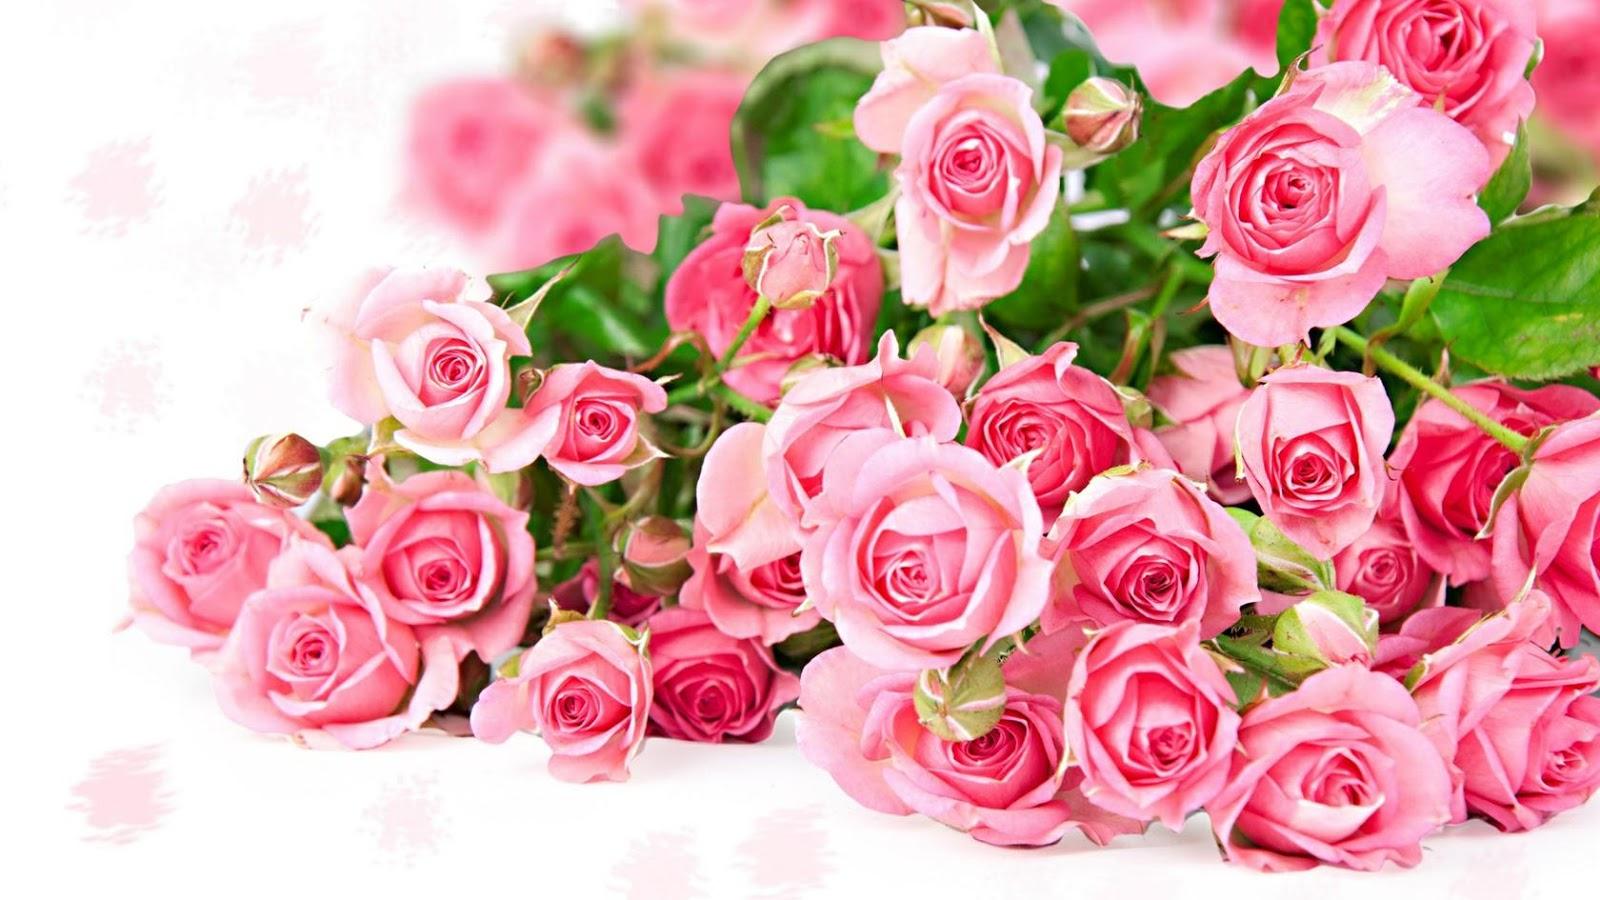 Pencinta Bunga Cantik Khas Surabaya